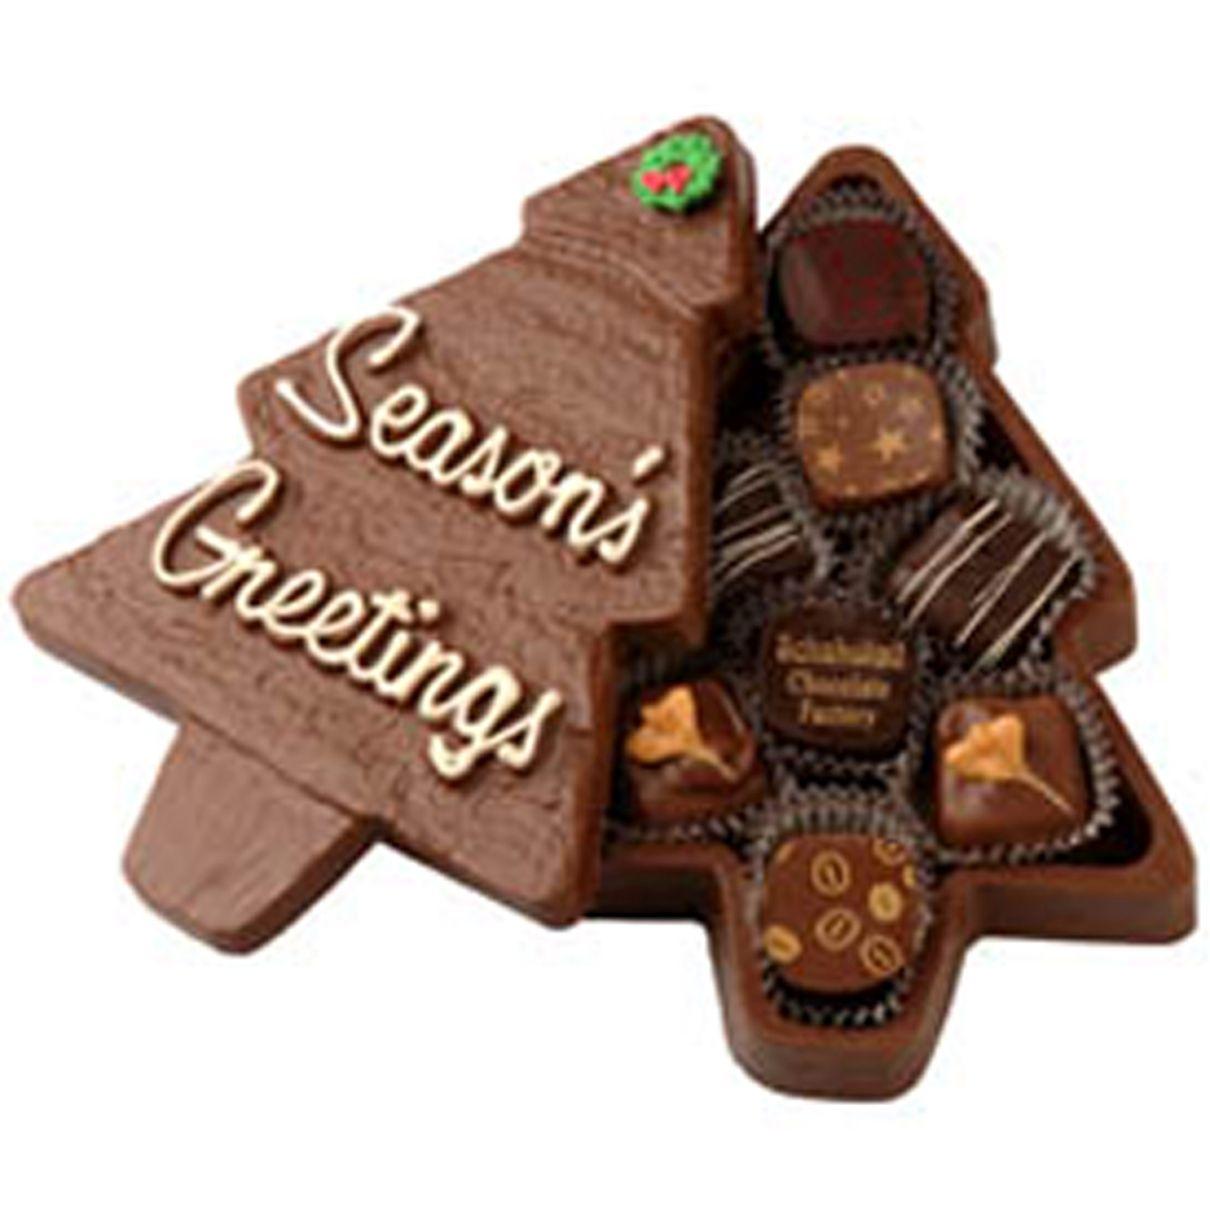 Happy Holidays! | CHOCOLATE Tees | Pinterest | Chocolate